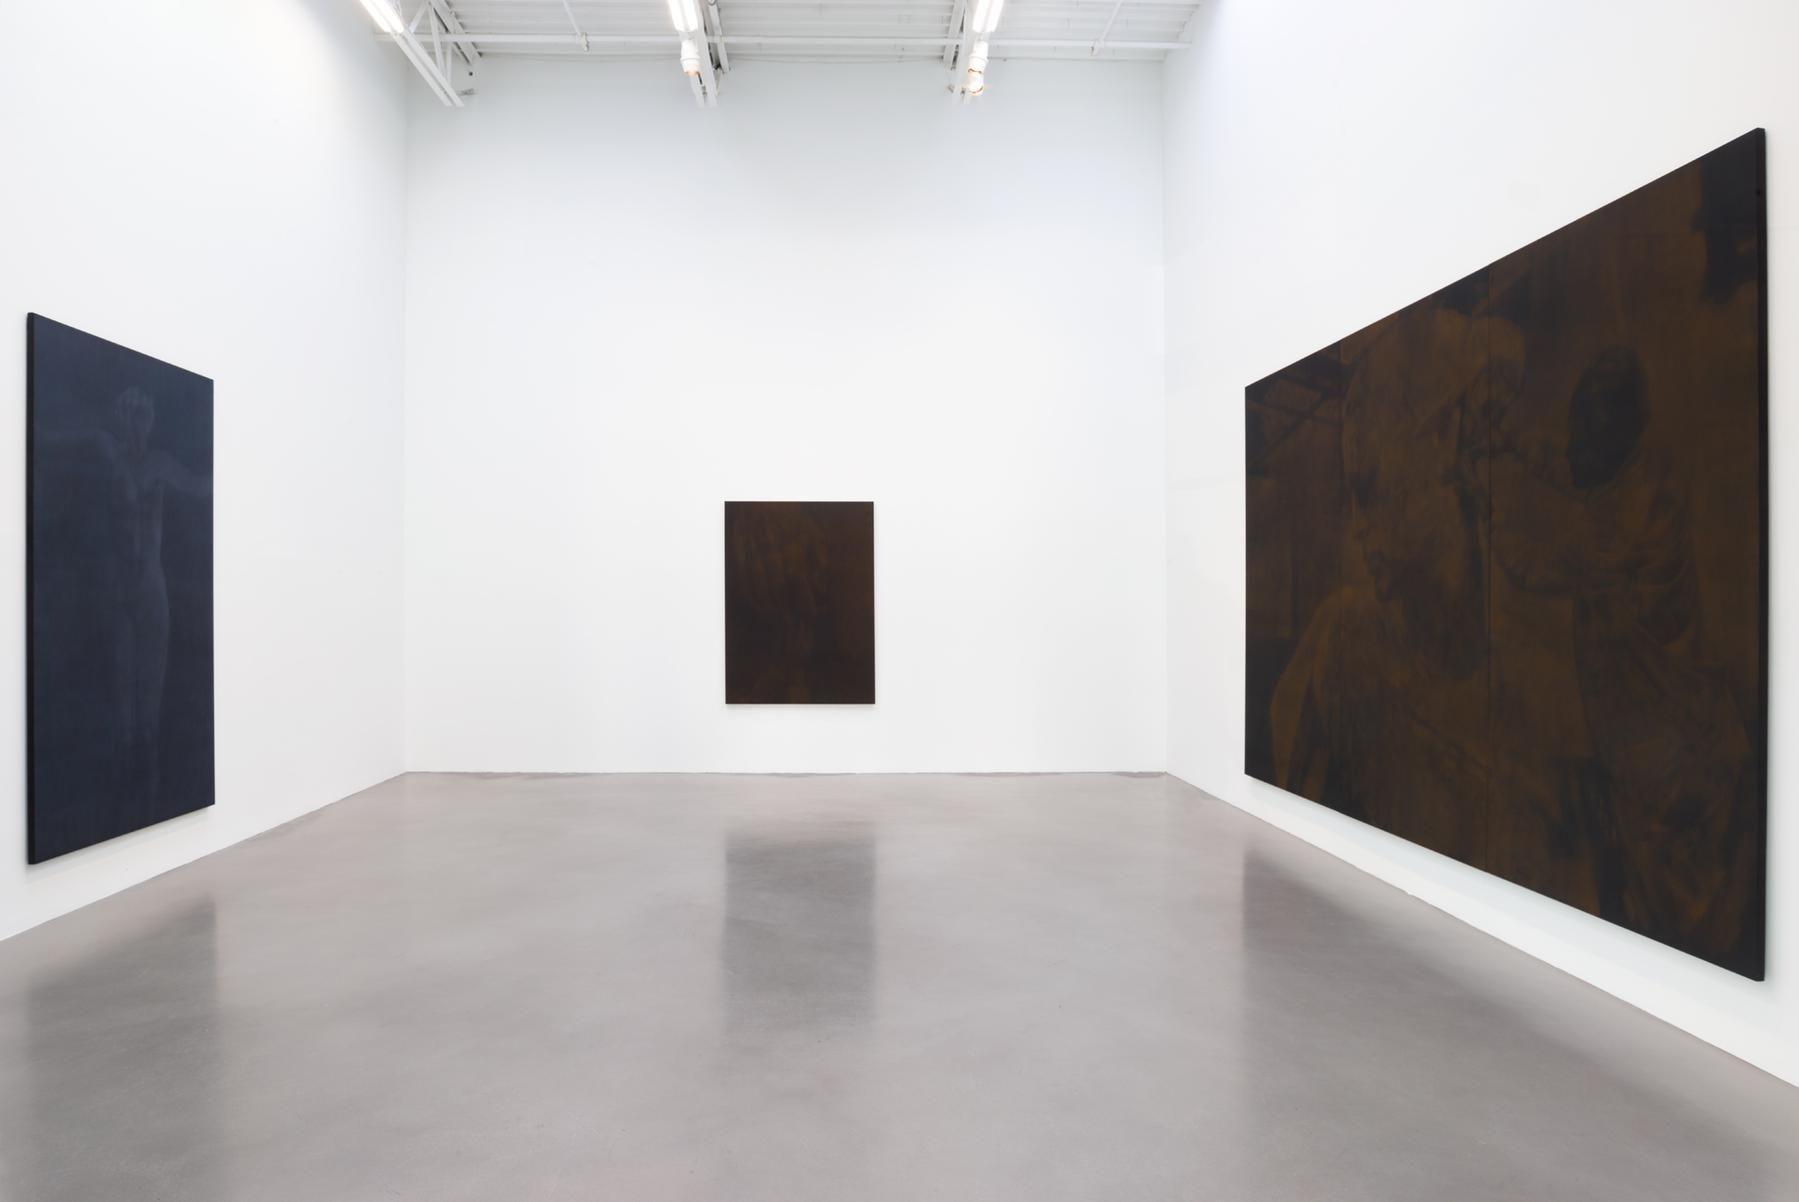 Troy Brauntuch Installation view 2